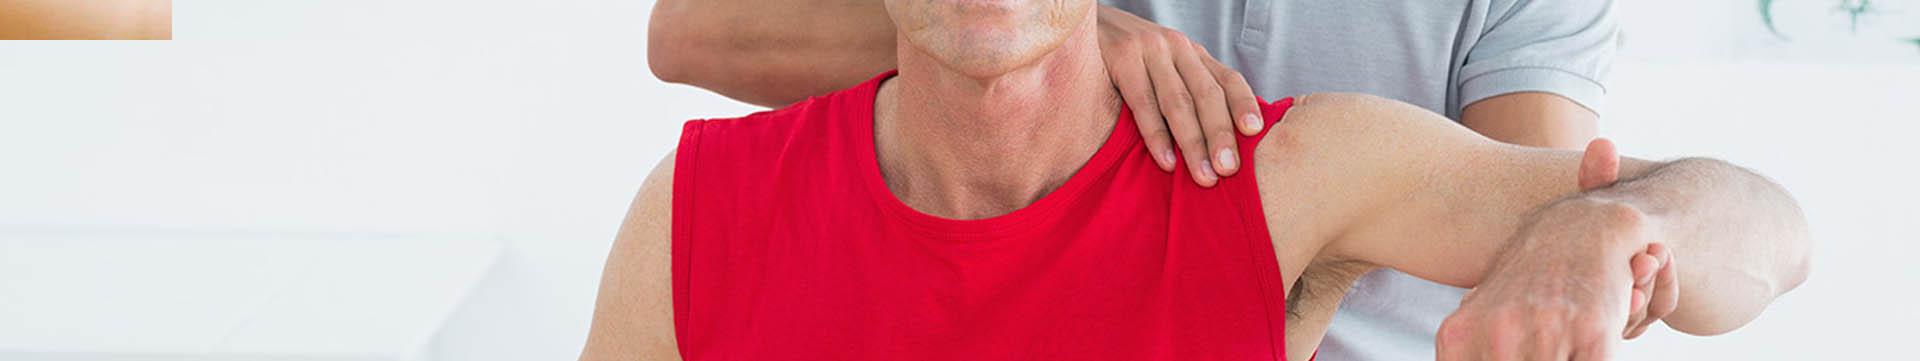 Lympho - Terapia Fisica Complessa